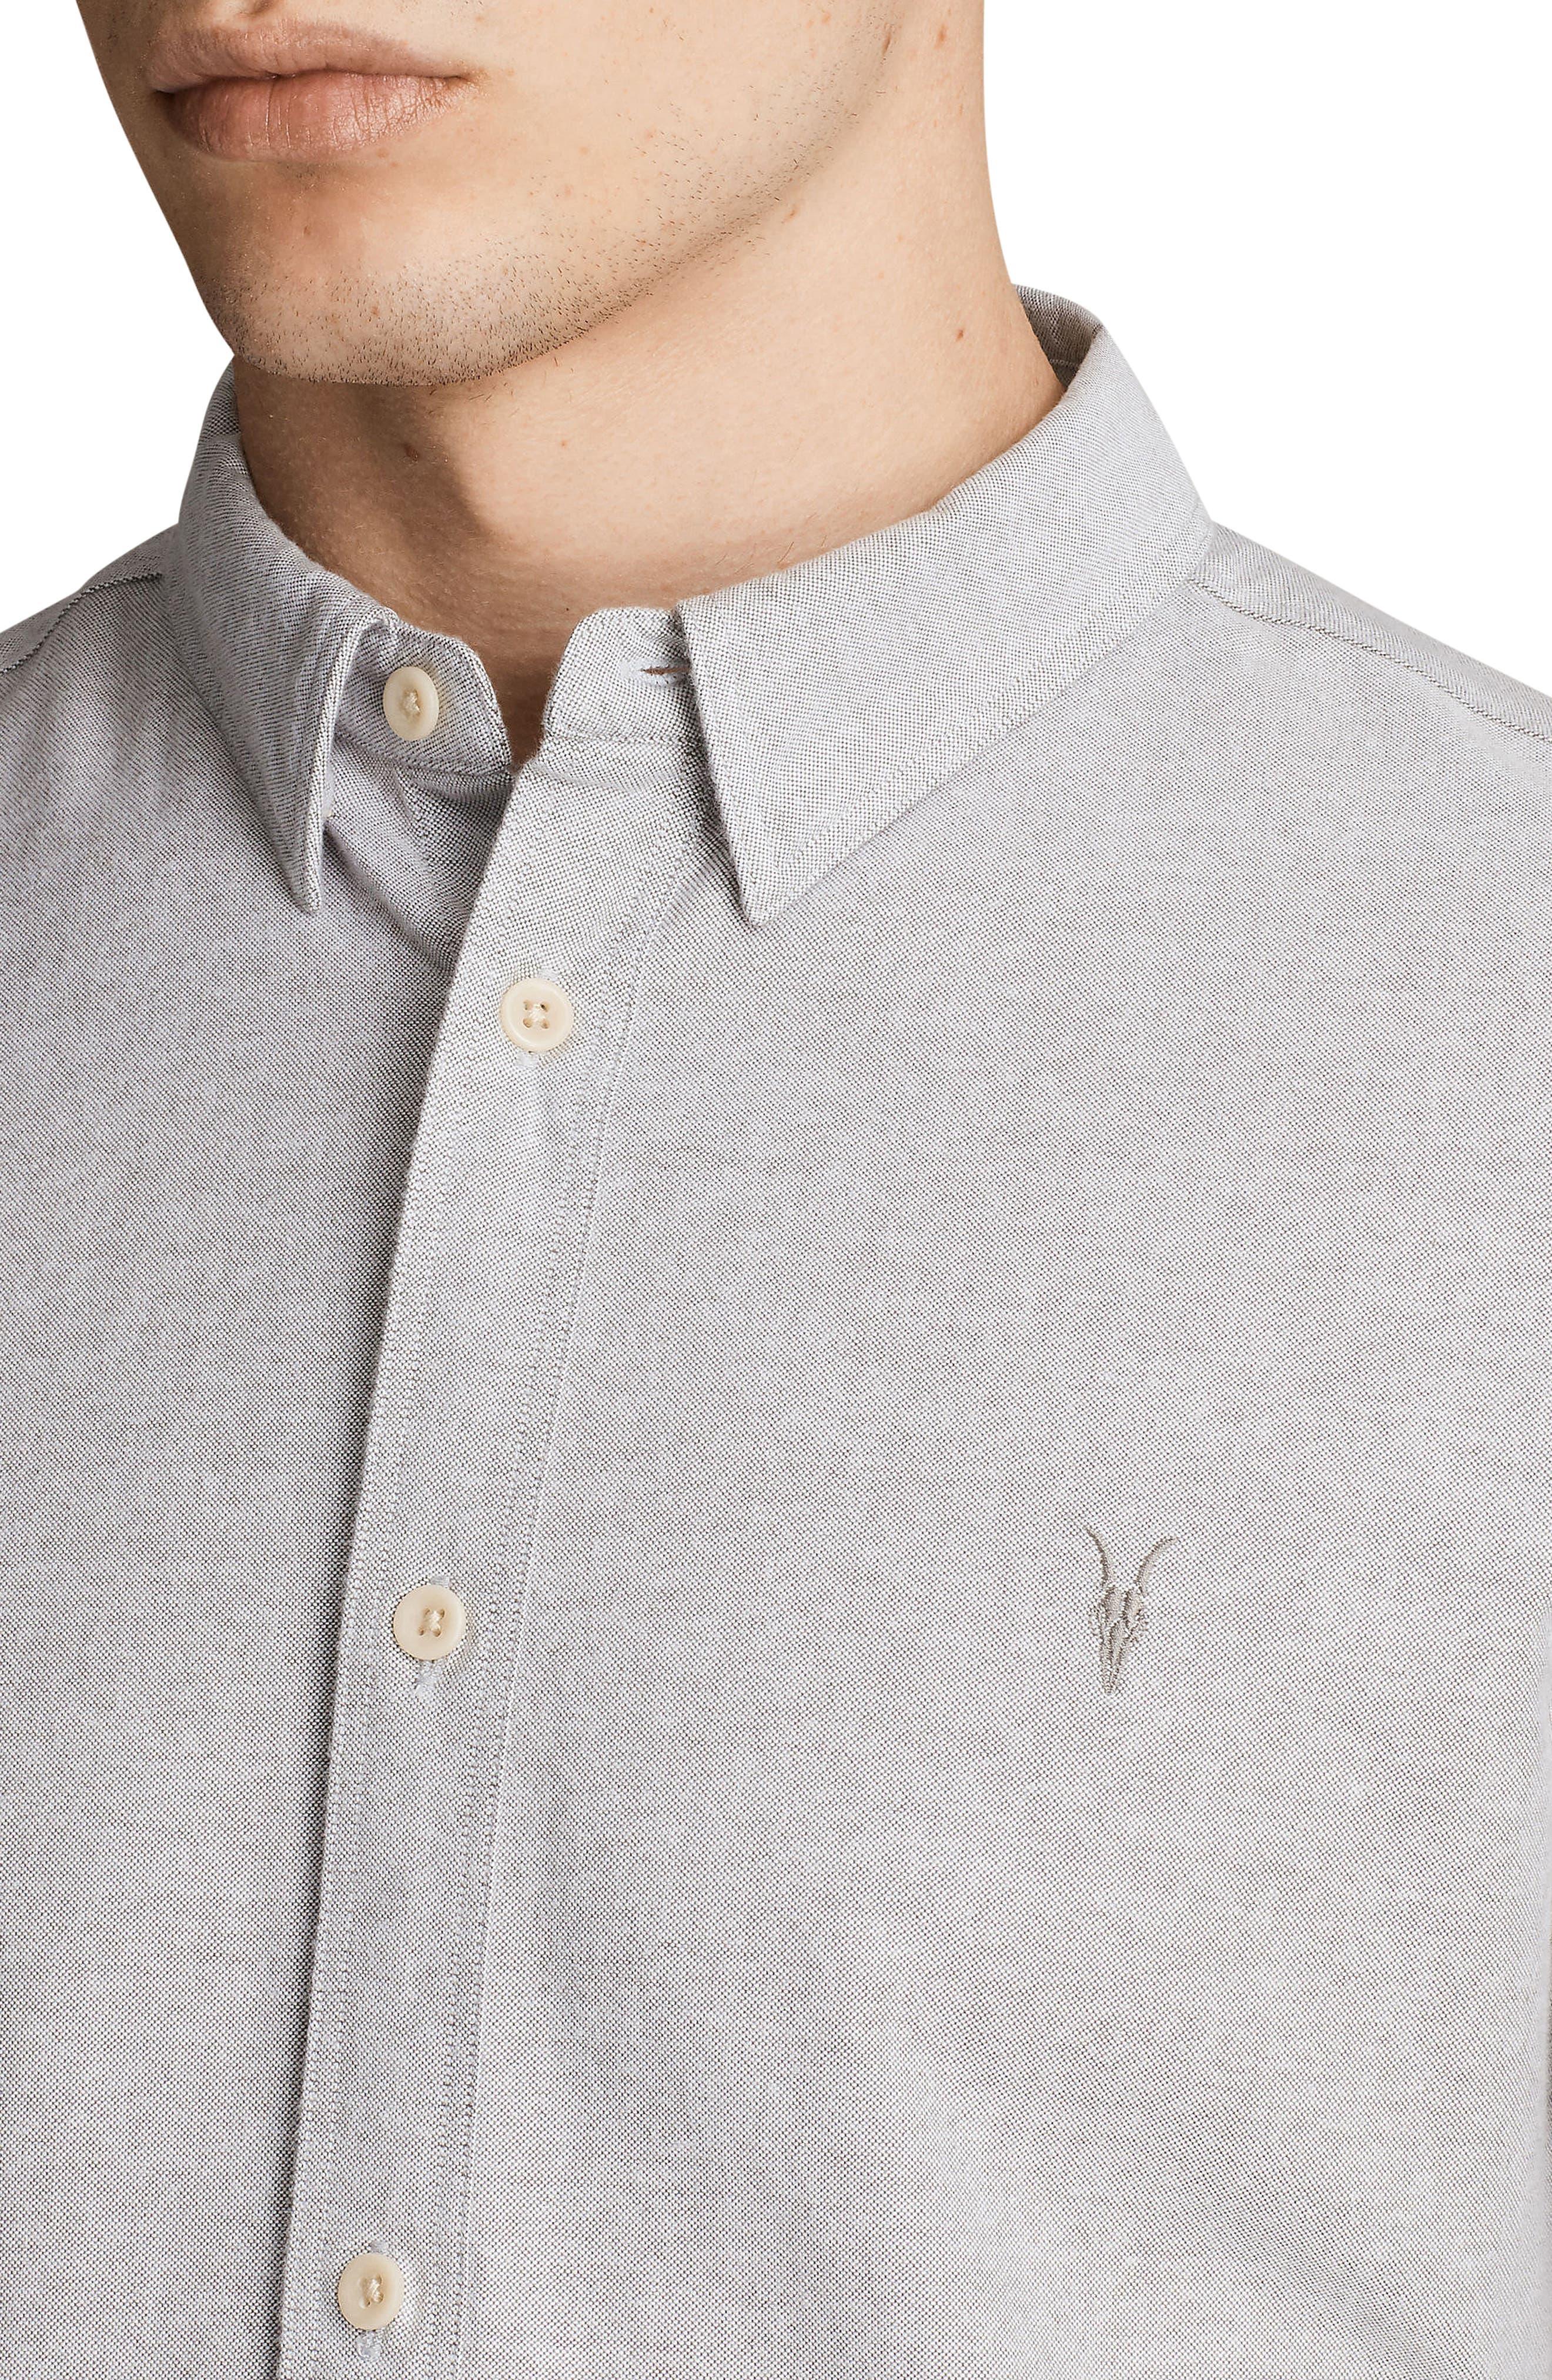 Huntington Regular Fit Sport Shirt,                             Alternate thumbnail 3, color,                             DARK GULL GREY